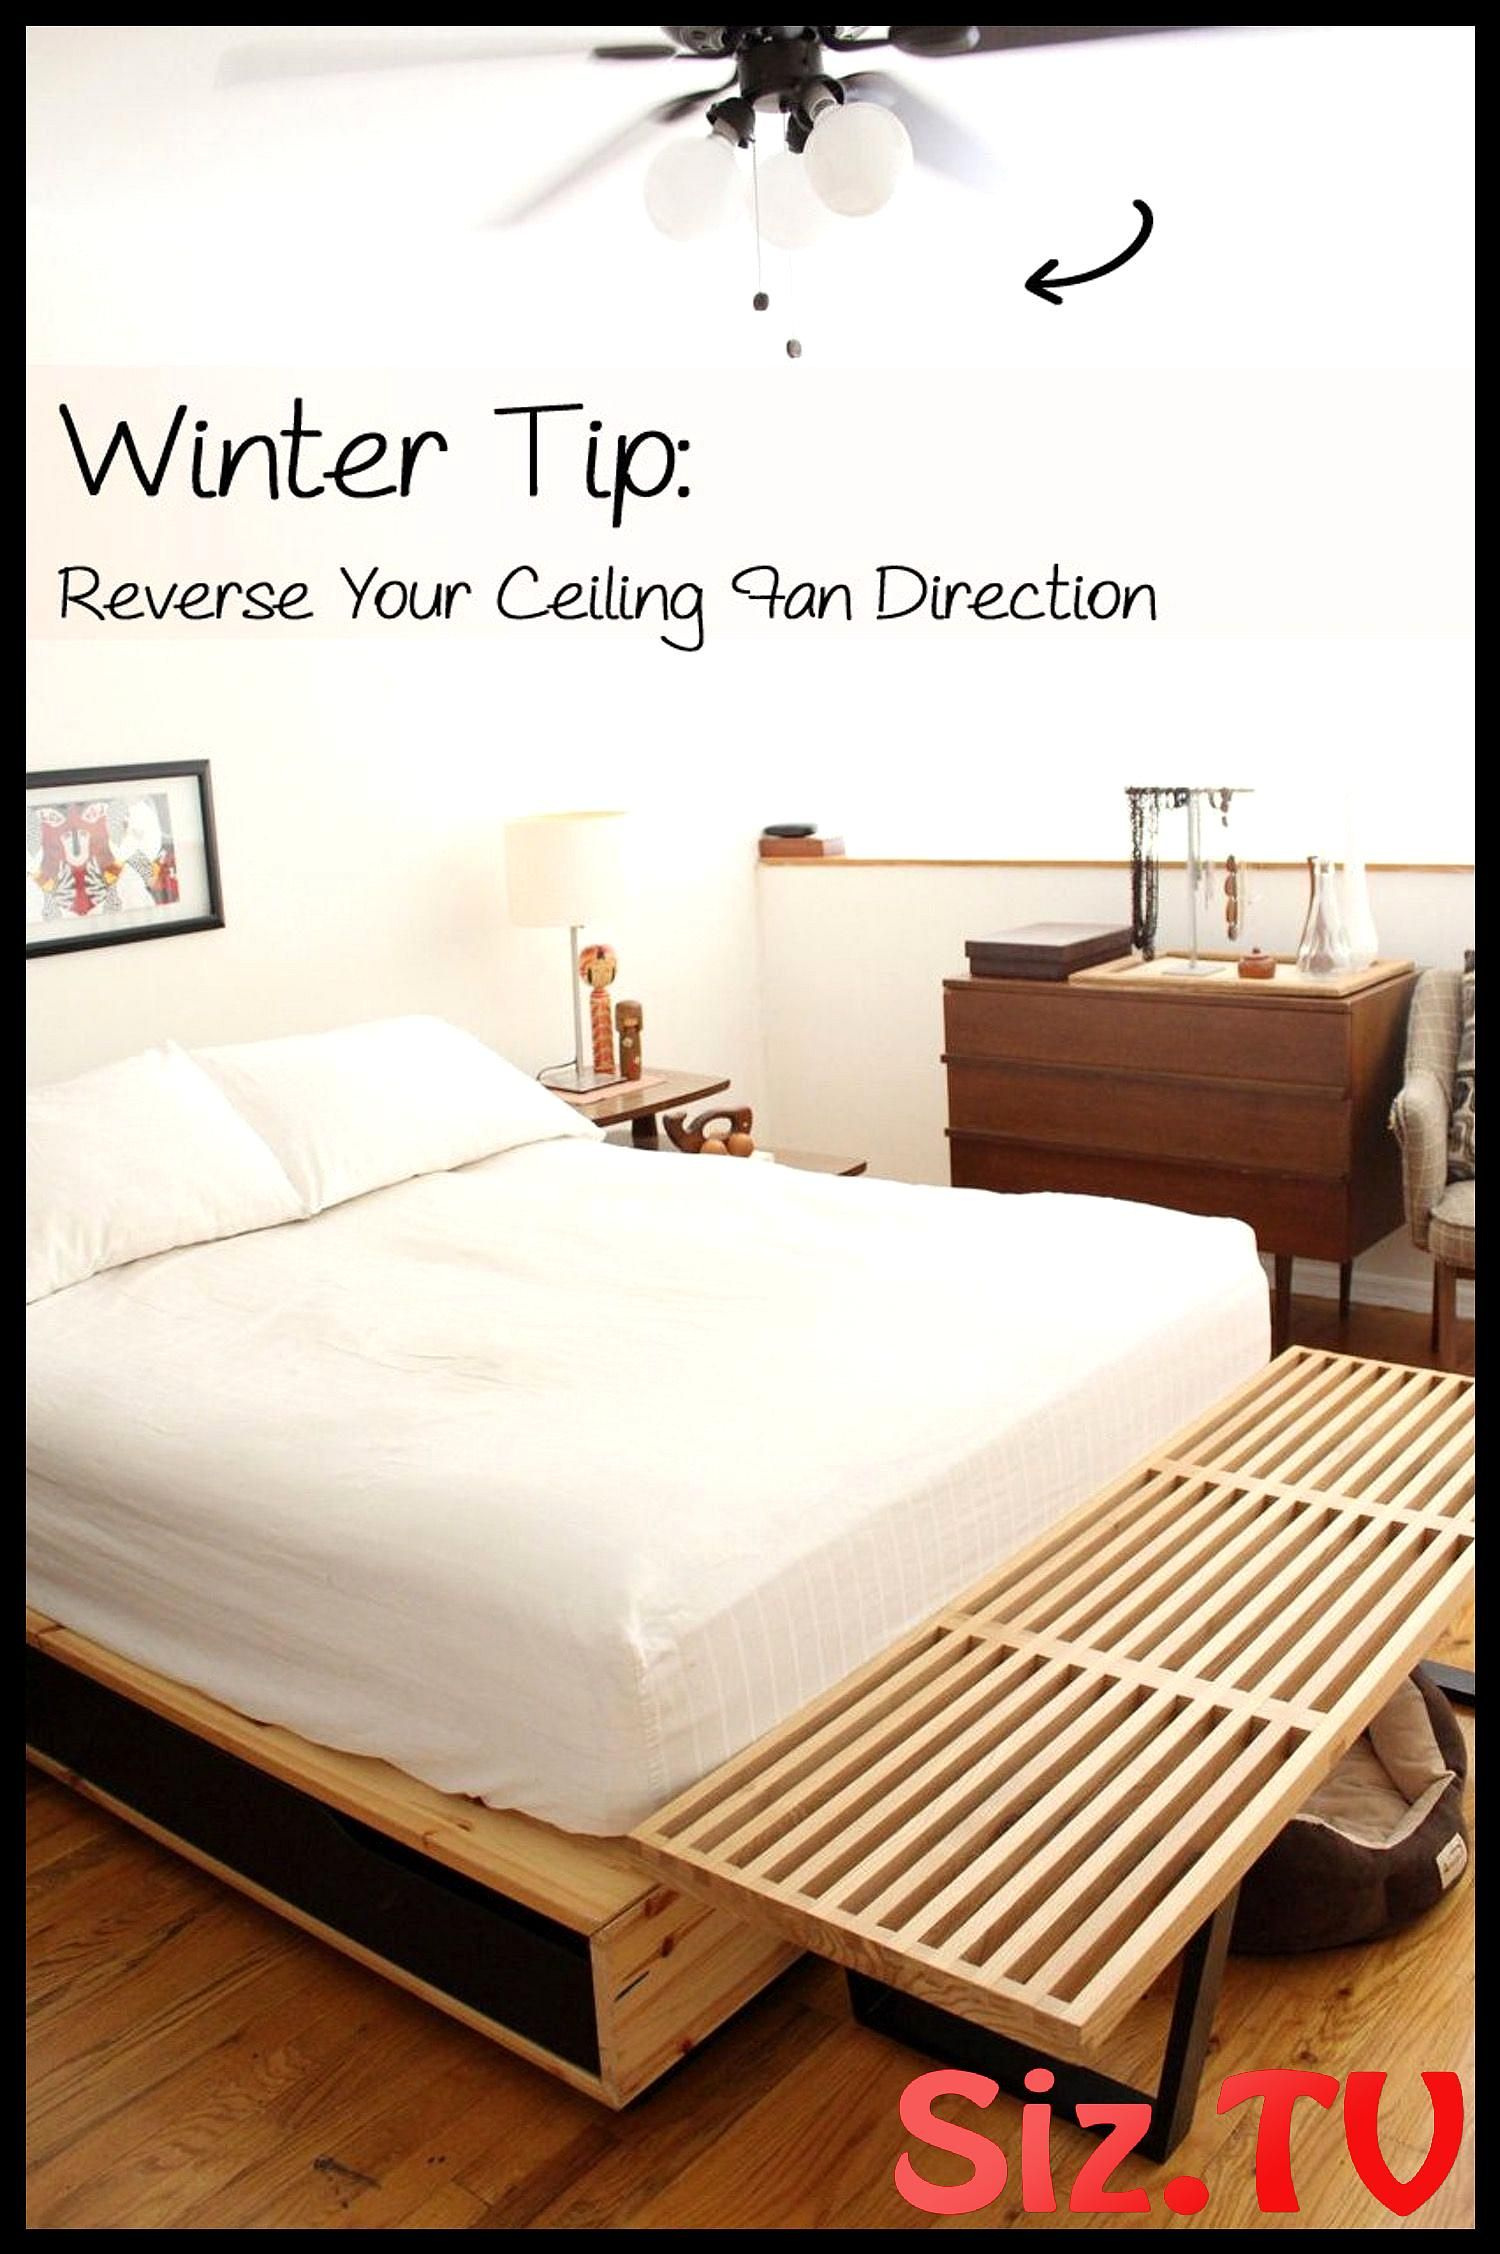 Winter Tip Reverse Your Ceiling Fan Direction And Save Energy Ceiling Fan Direction Home Remodel Bedroom